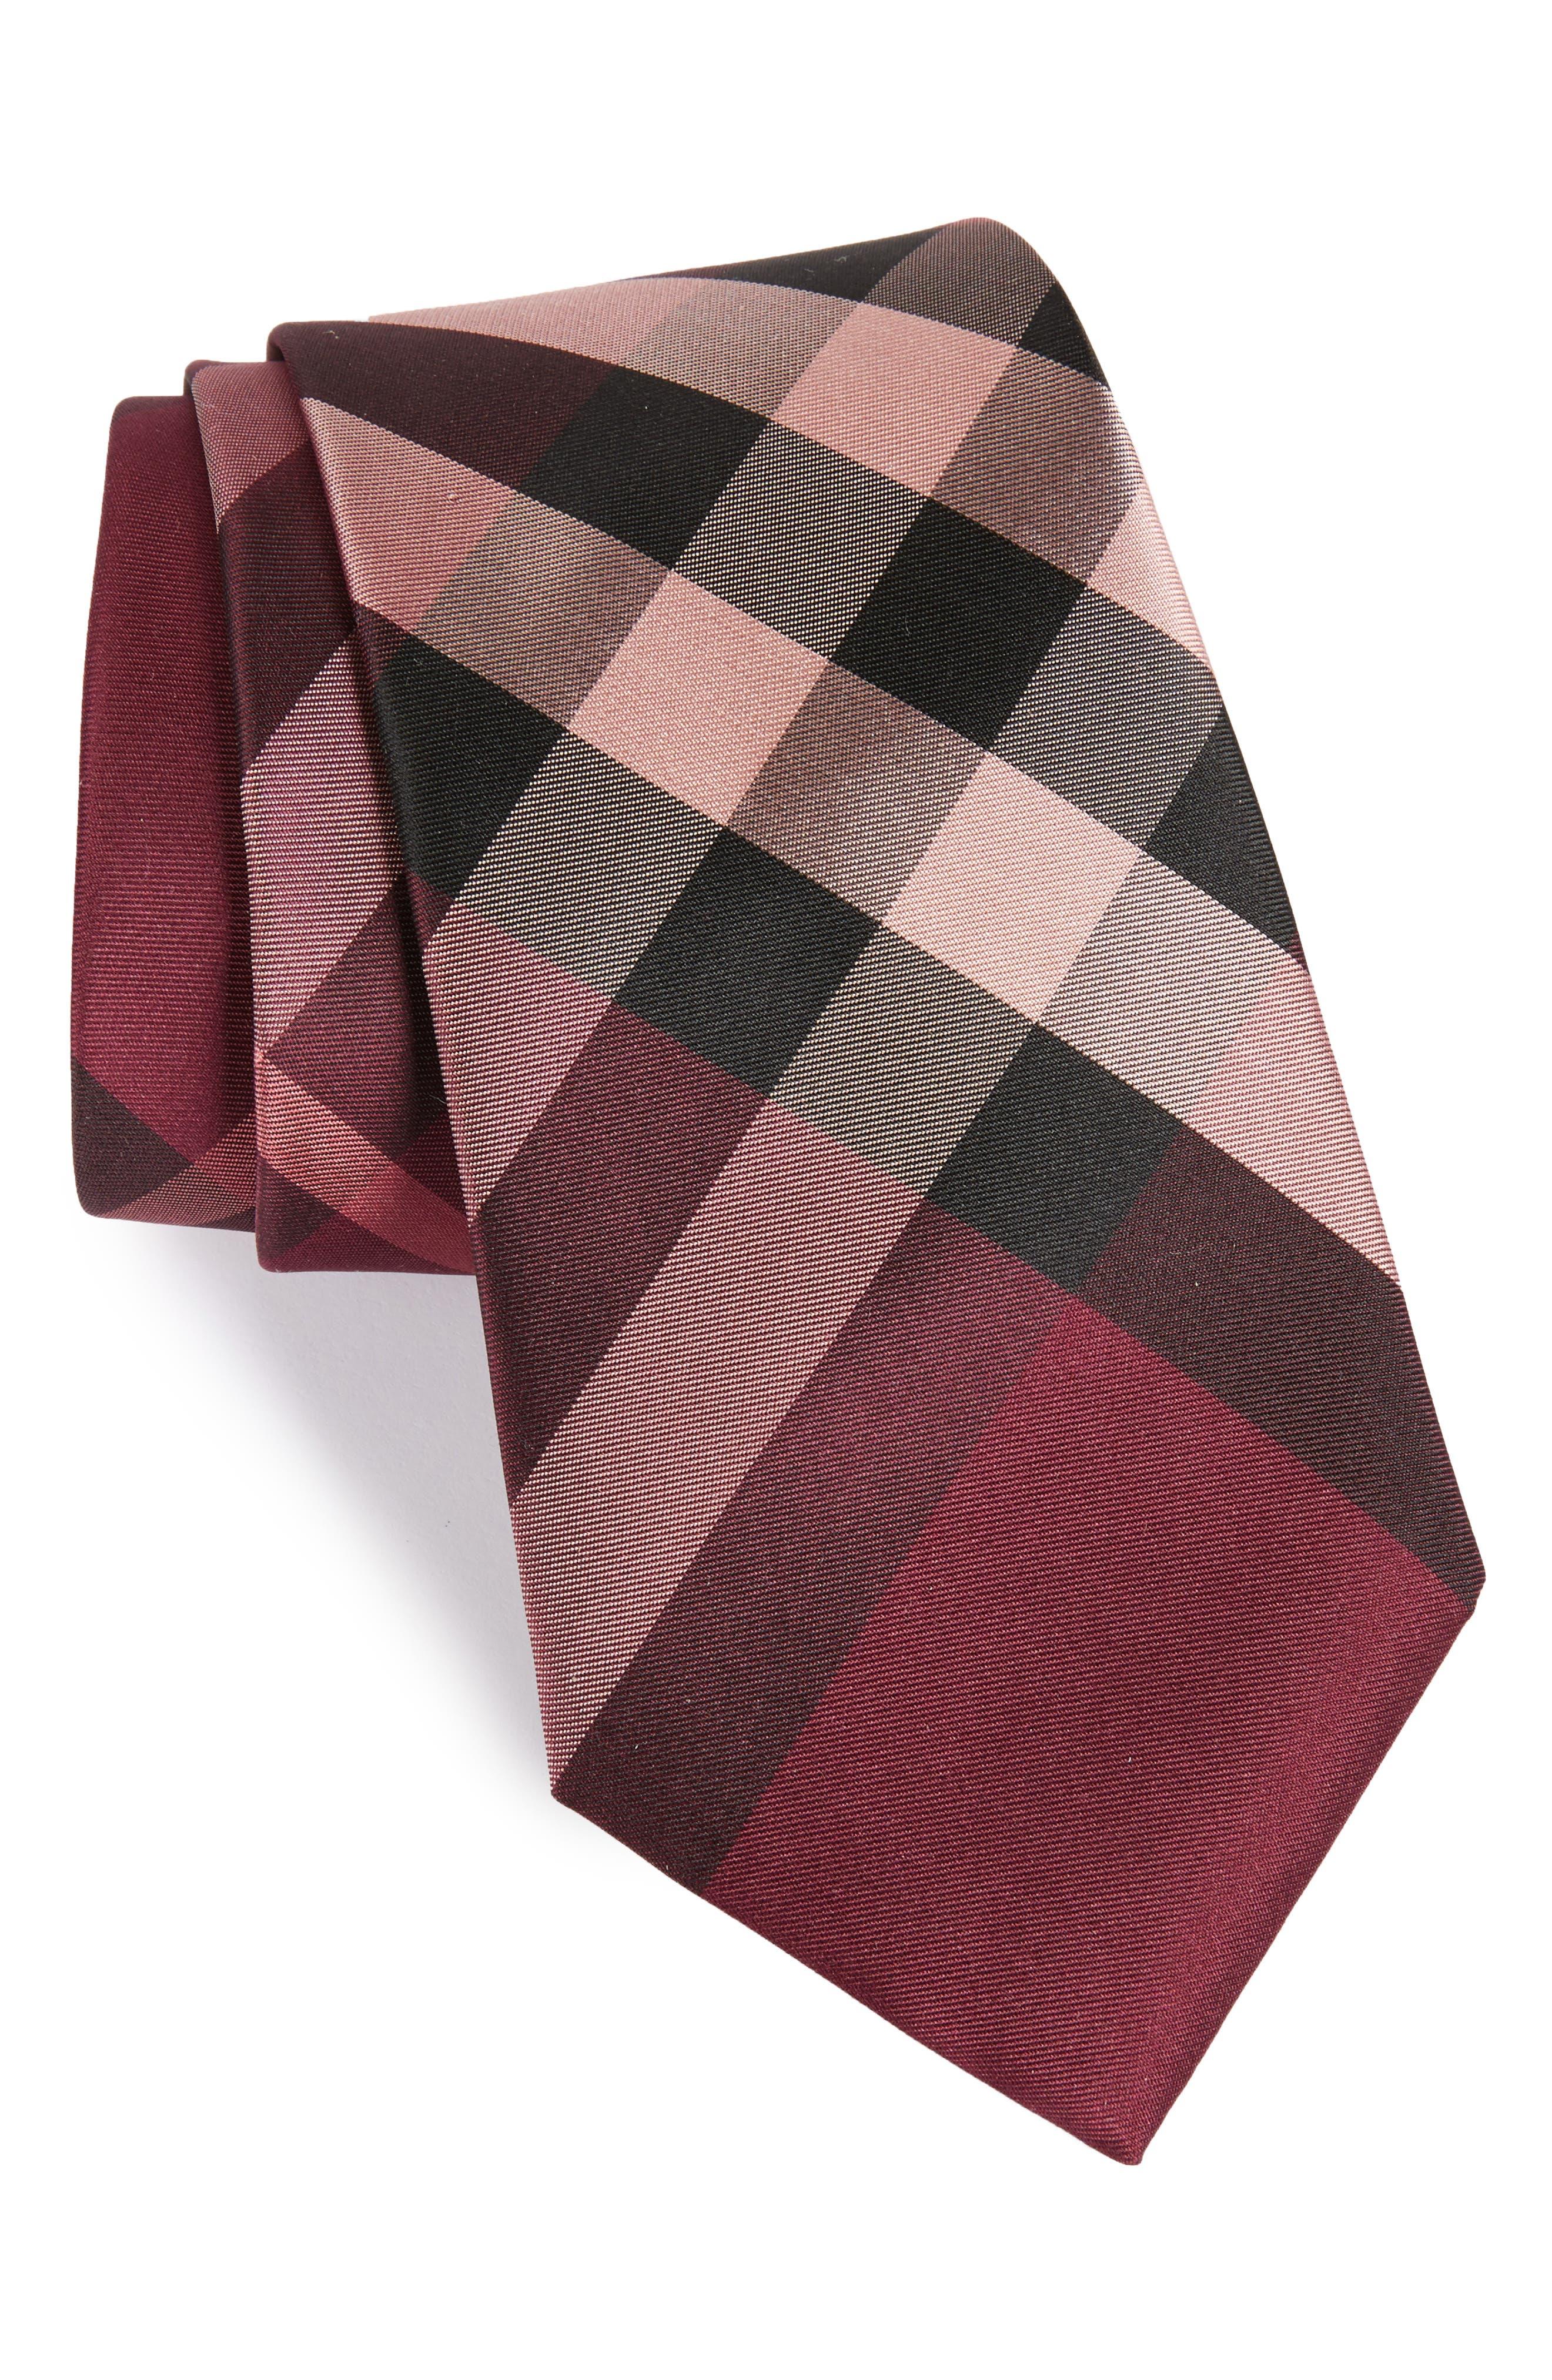 Alternate Image 1 Selected - Burberry Clinton Check Silk Tie